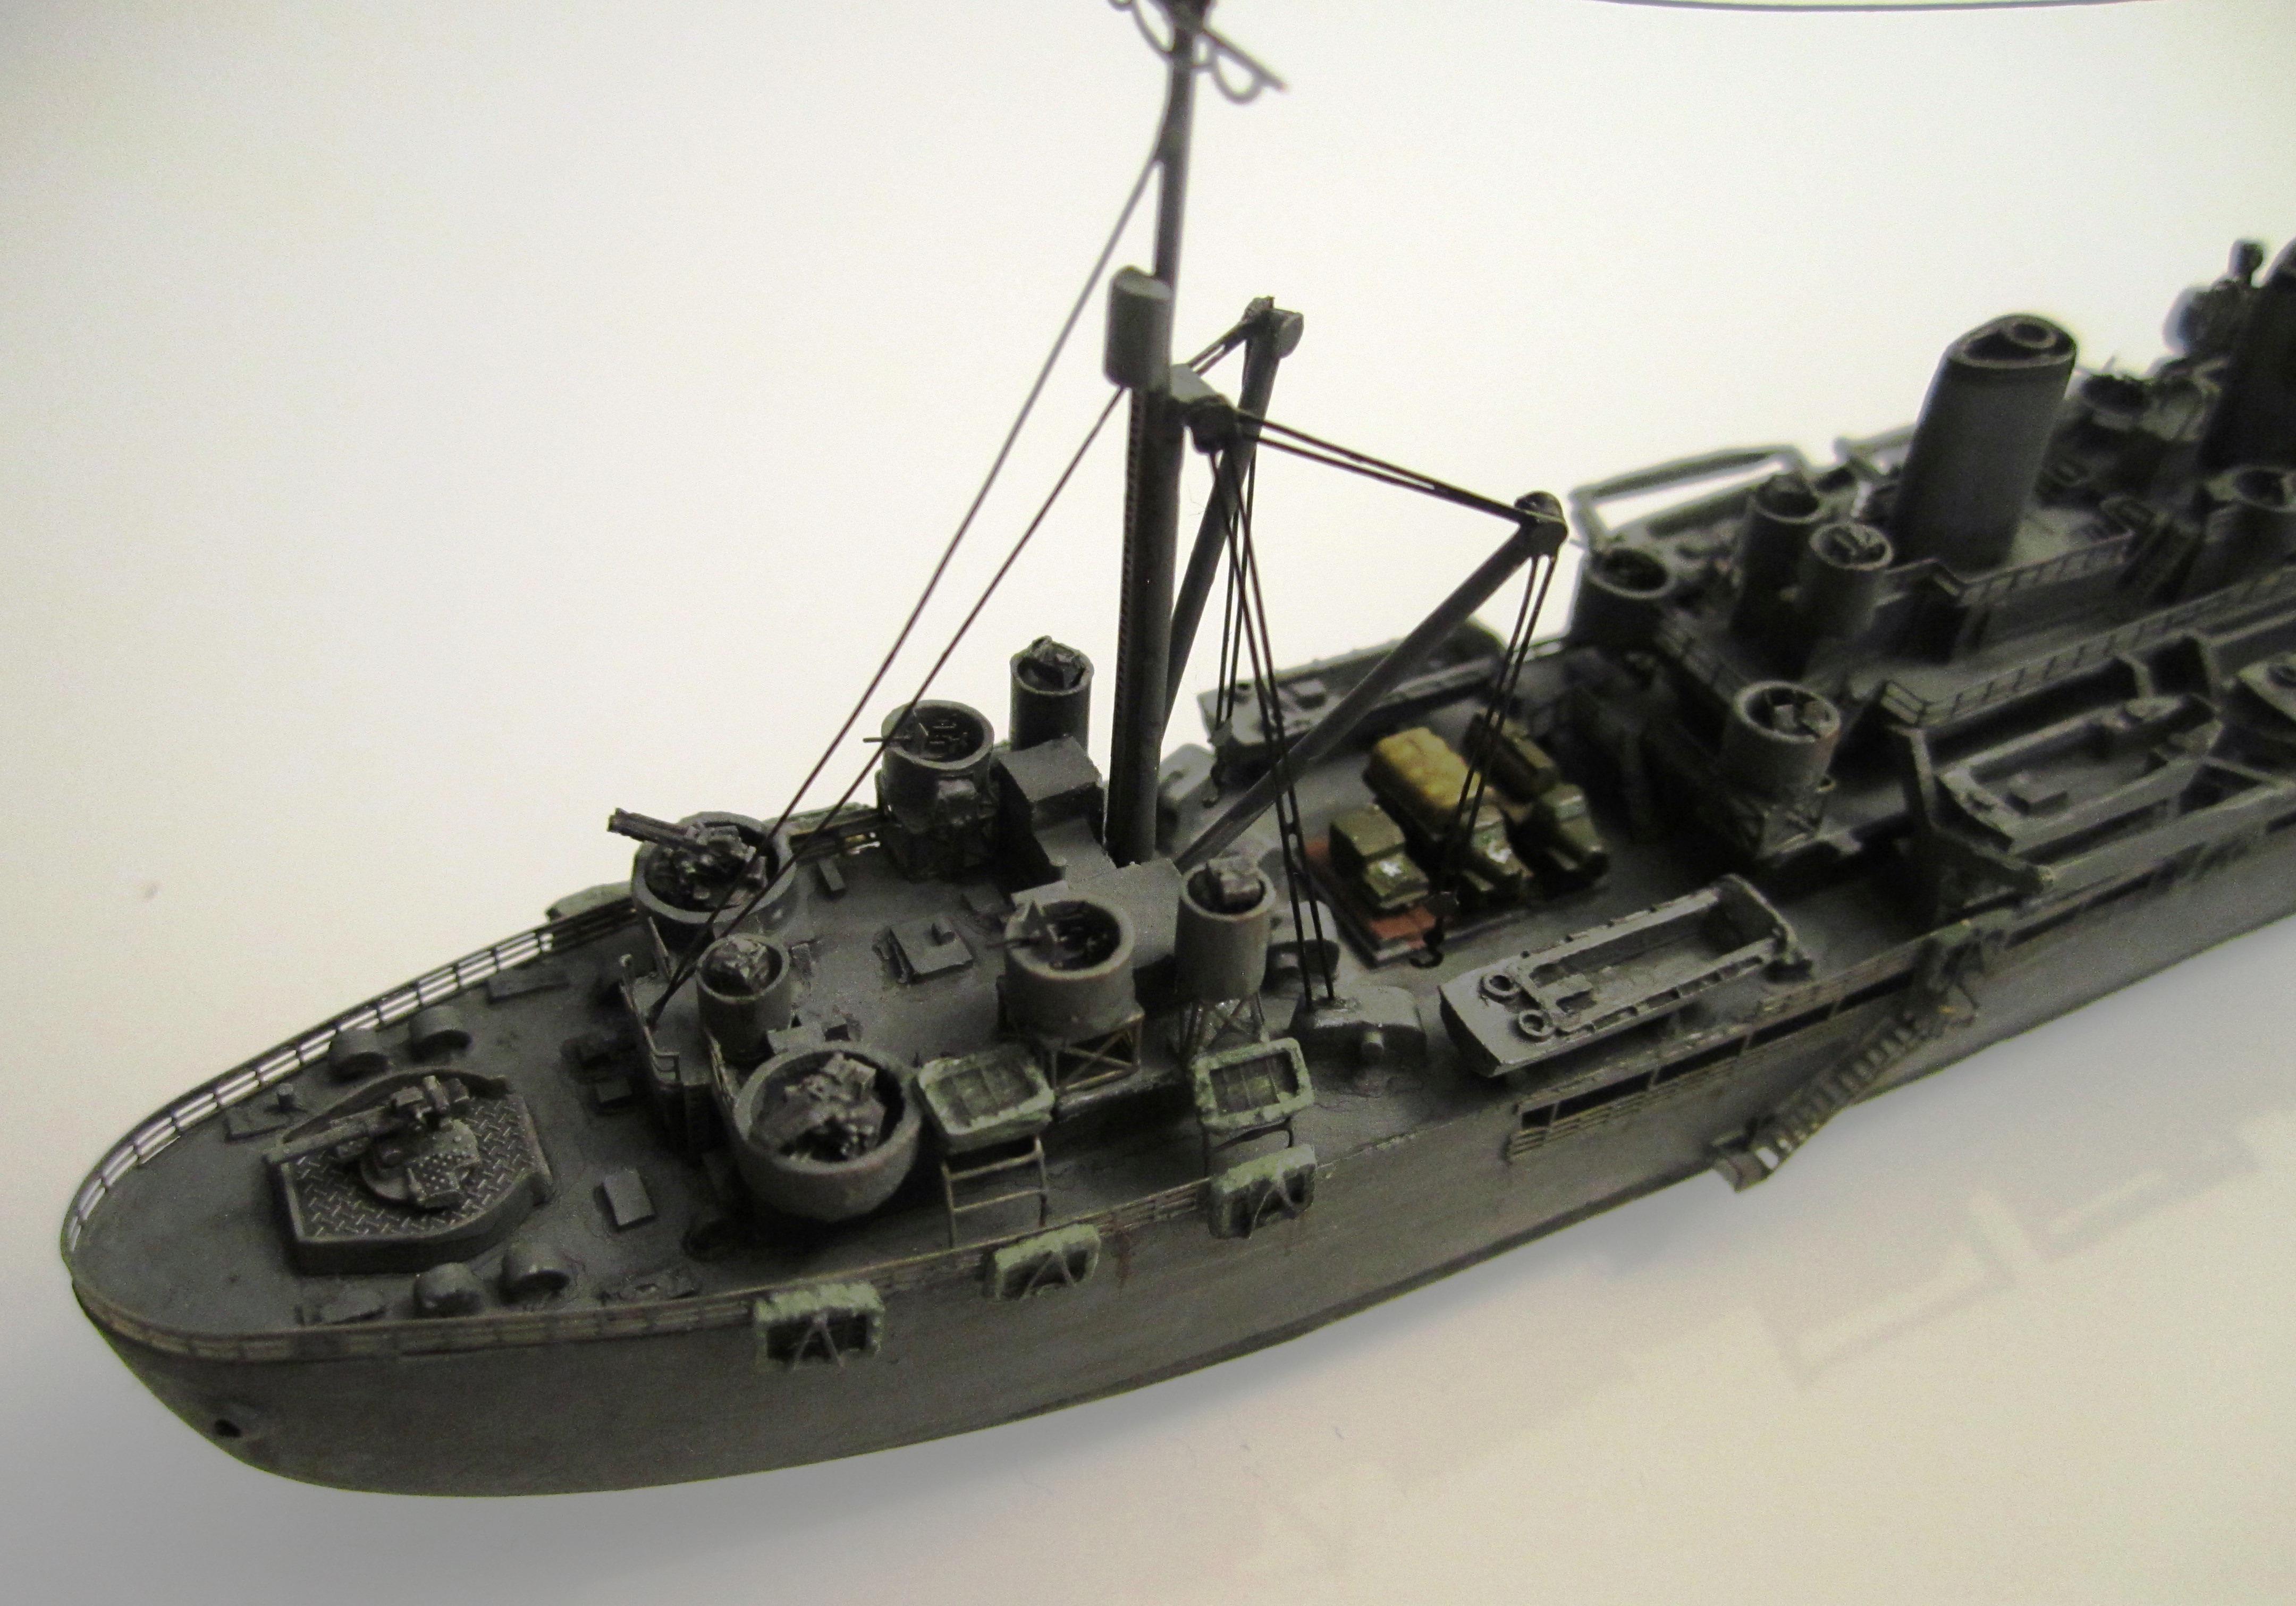 Transport de troupes US 1/700 - USS Gilliam - Nesquik PwrONY